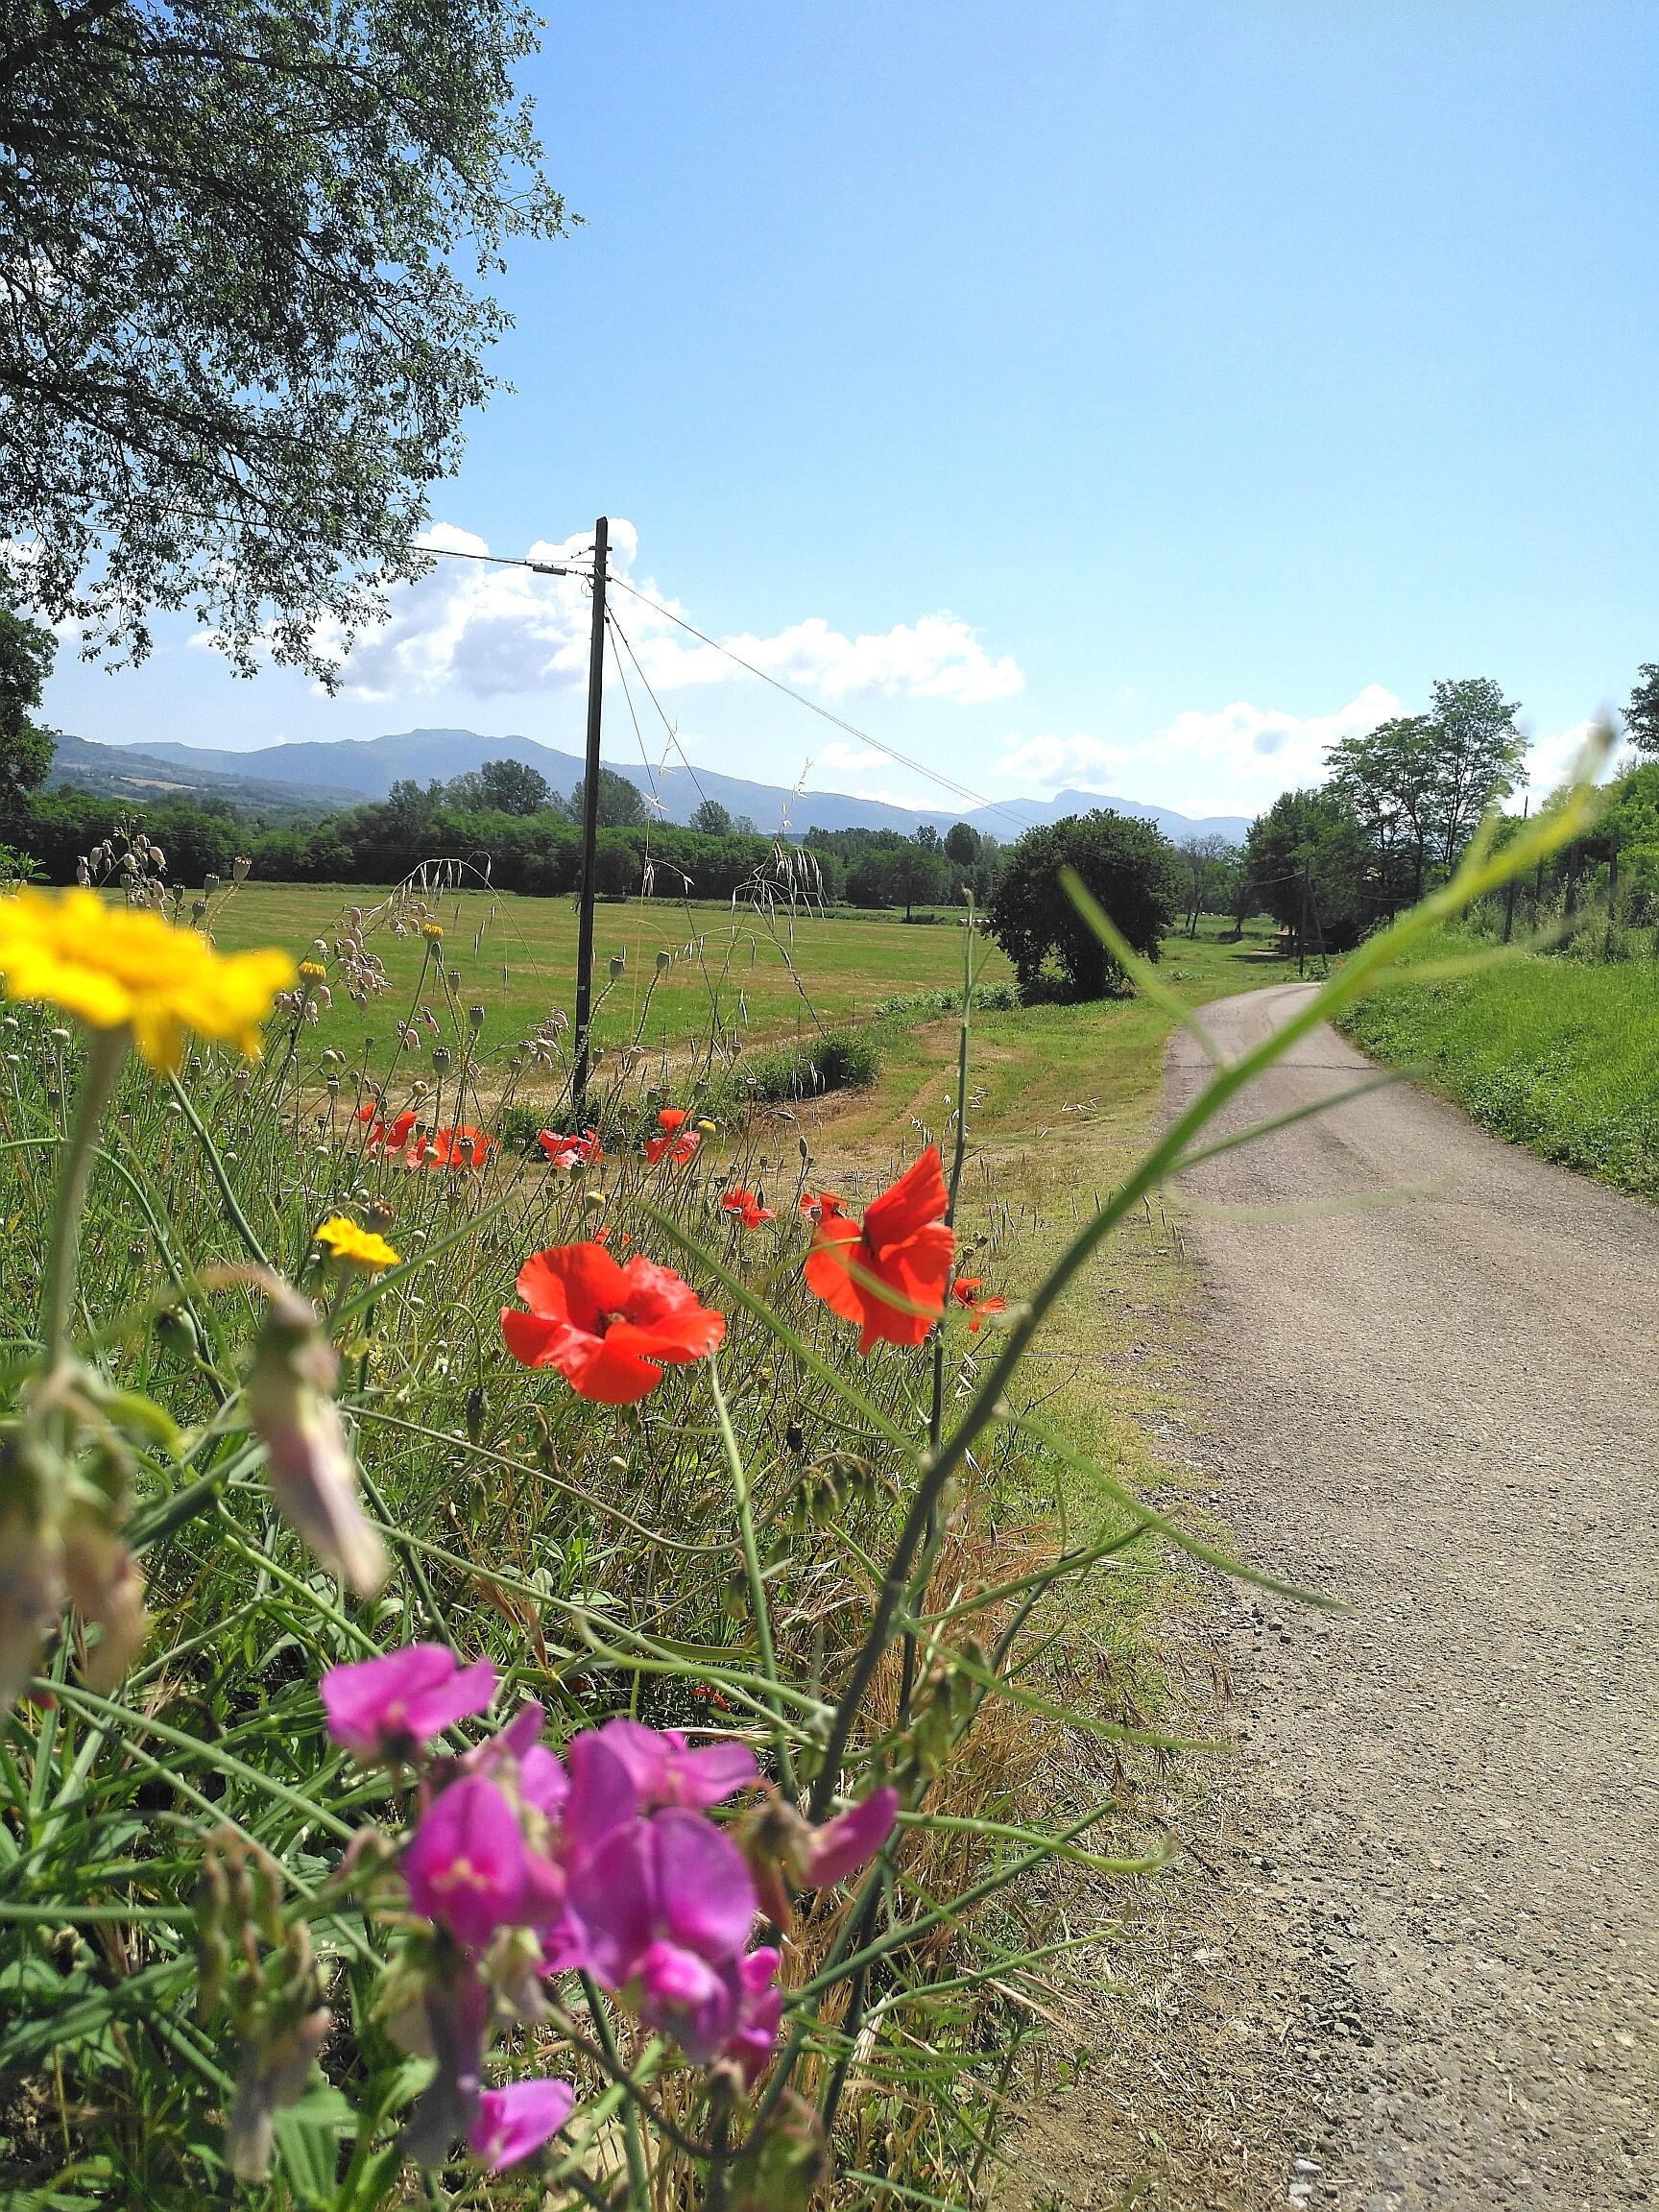 Via Ghibellina, Prato di Strada - La Verna